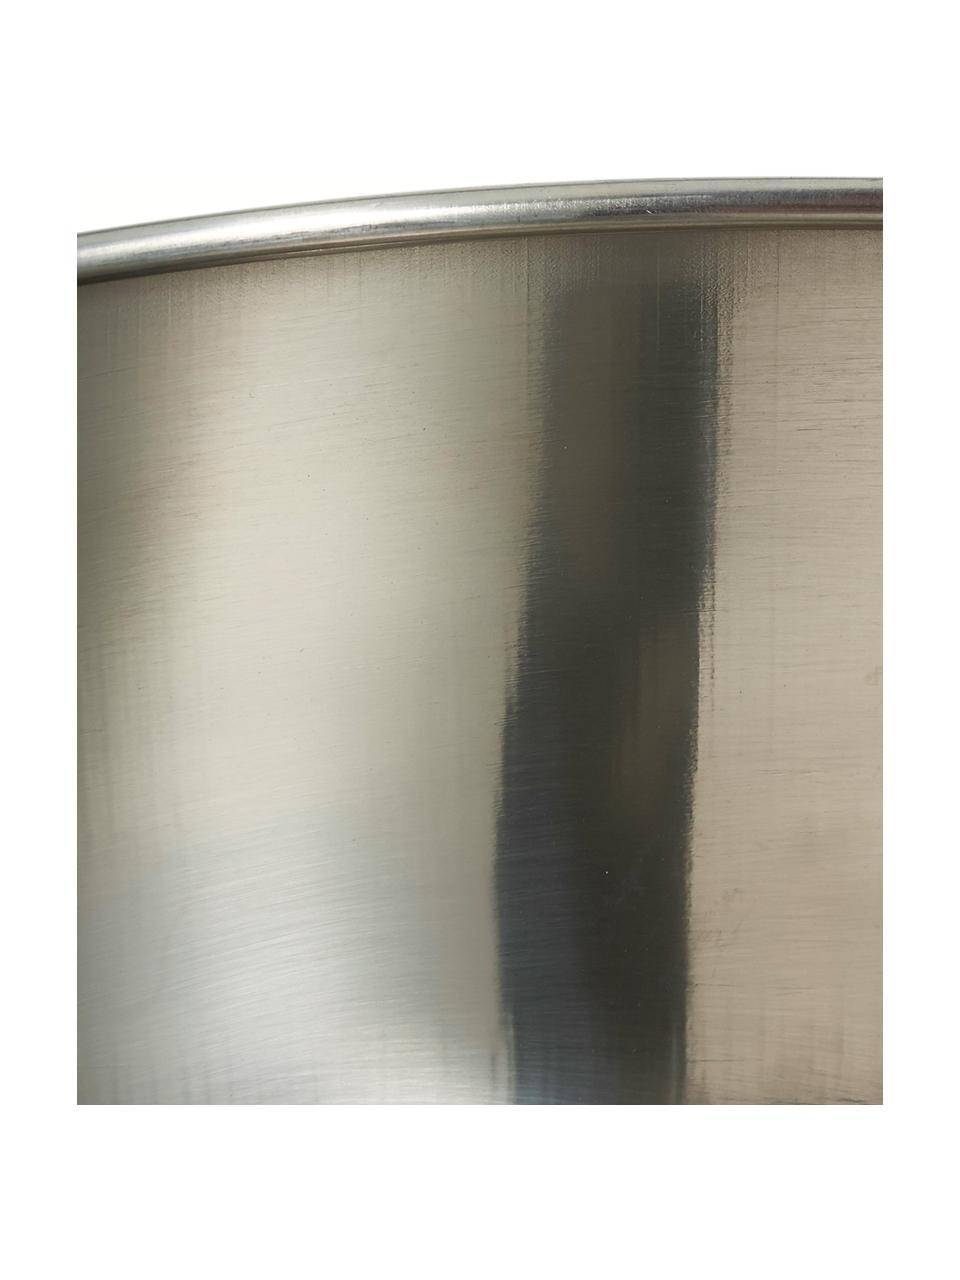 Ciotola centrotavola dorata Master Class, Esterno: acciaio inossidabile rive, Interno: acciaio inossidabile, Colori ottone, acciaio inossidabile, Ø 21 x Alt. 12 cm